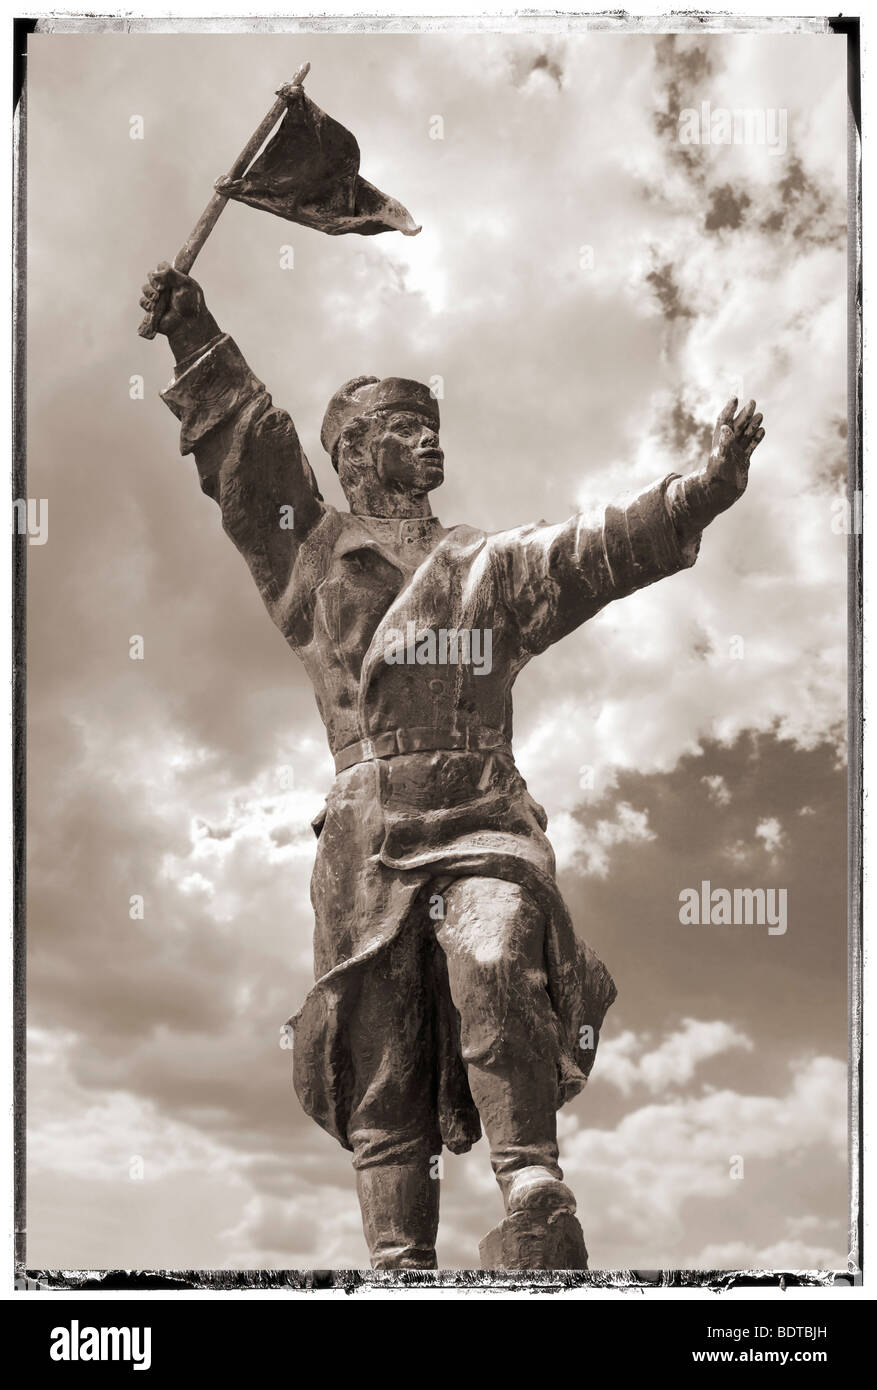 Osztyapenko Statue in the Memento Sculpture Park - Communist Sculptures museum - Budapest - Hungary - Stock Image